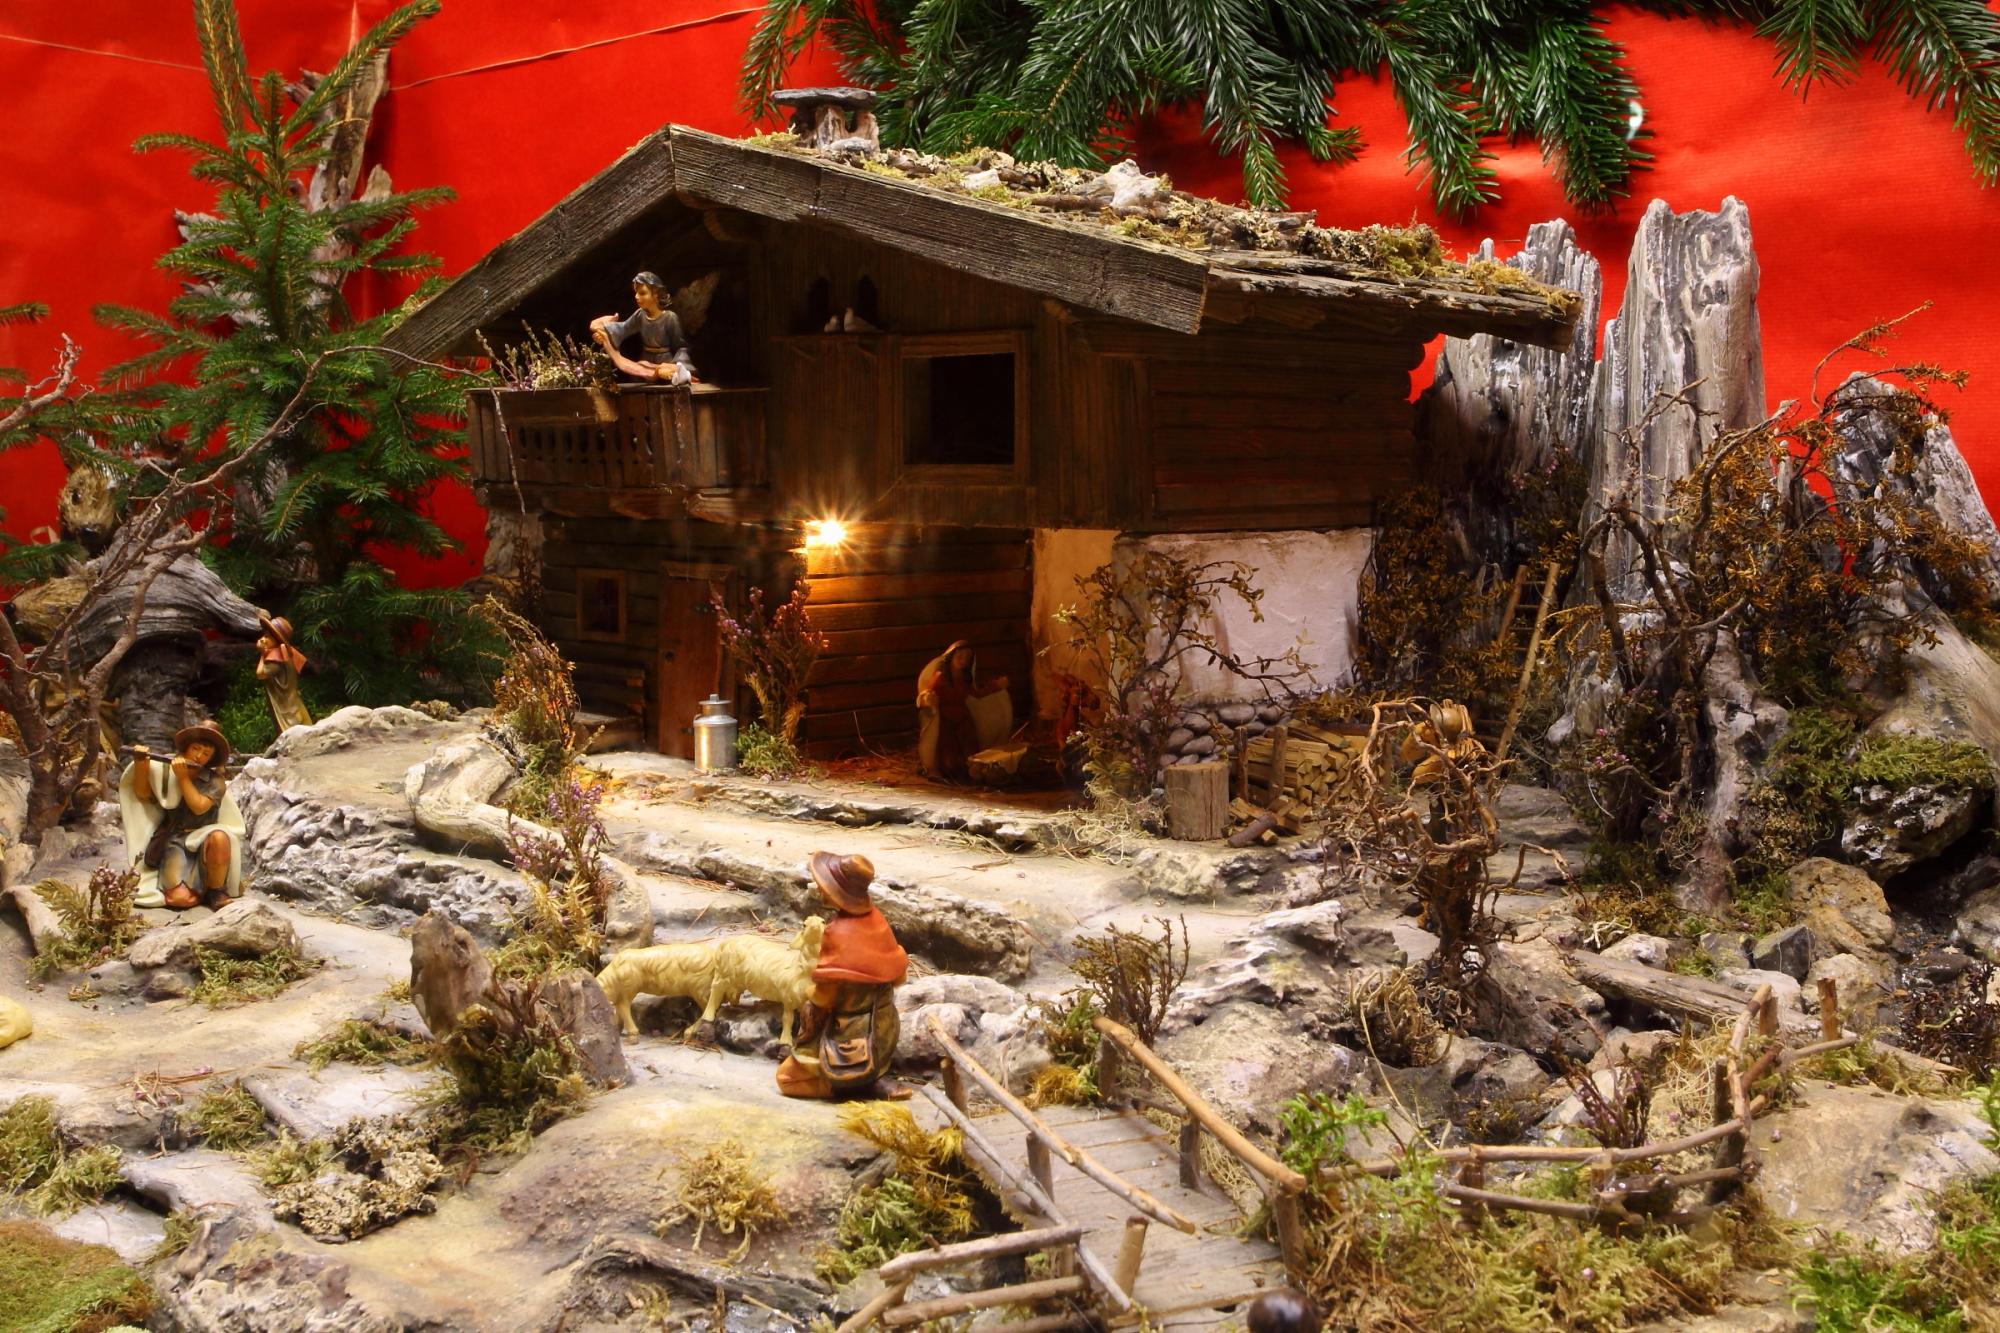 Nativity scene exhibition in Grossarl